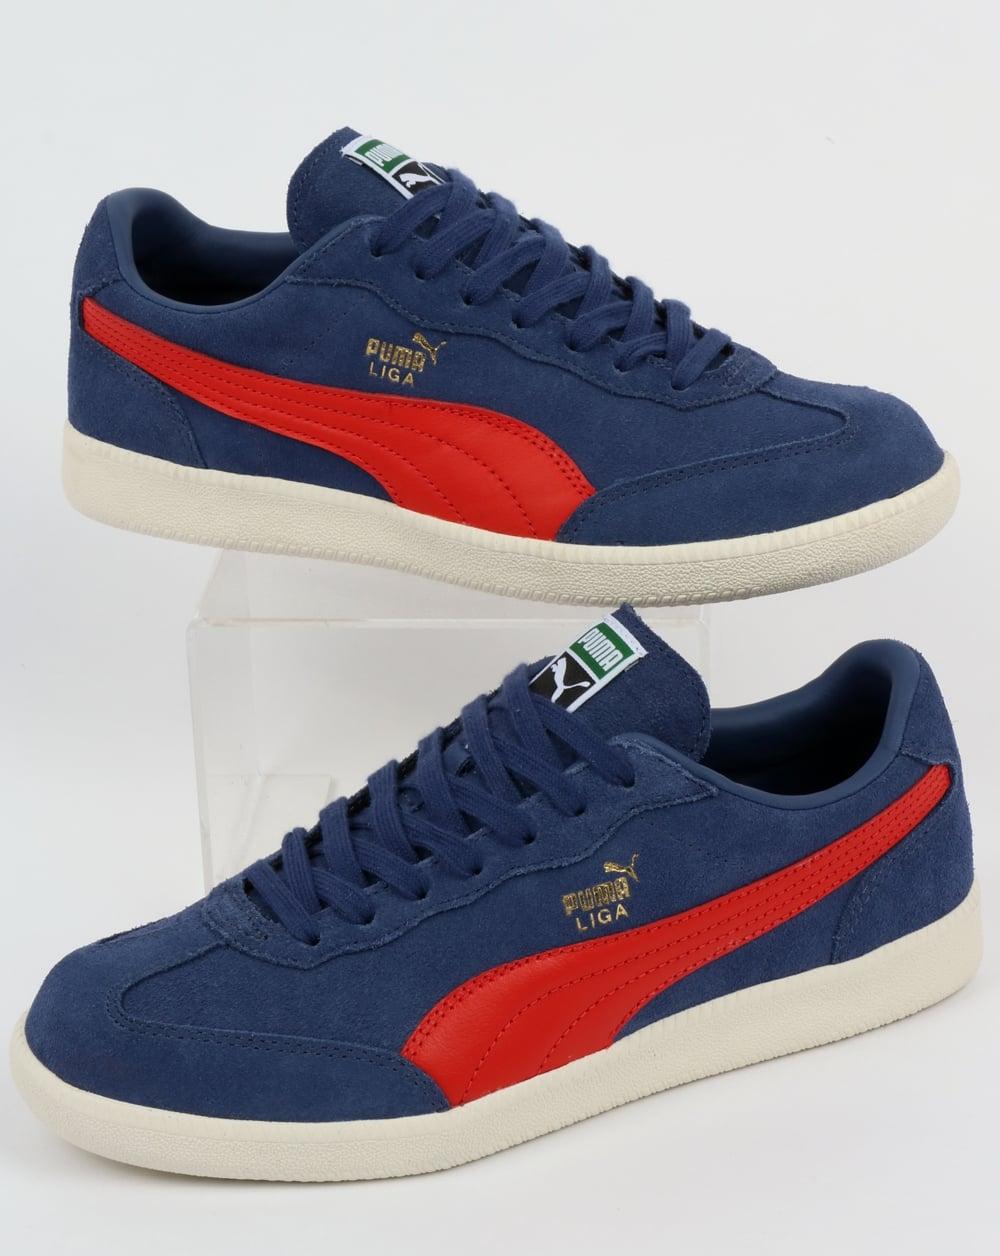 02687ccc3f04db Puma Puma Liga Suede Trainers Blue Indigo Flame Scarlet